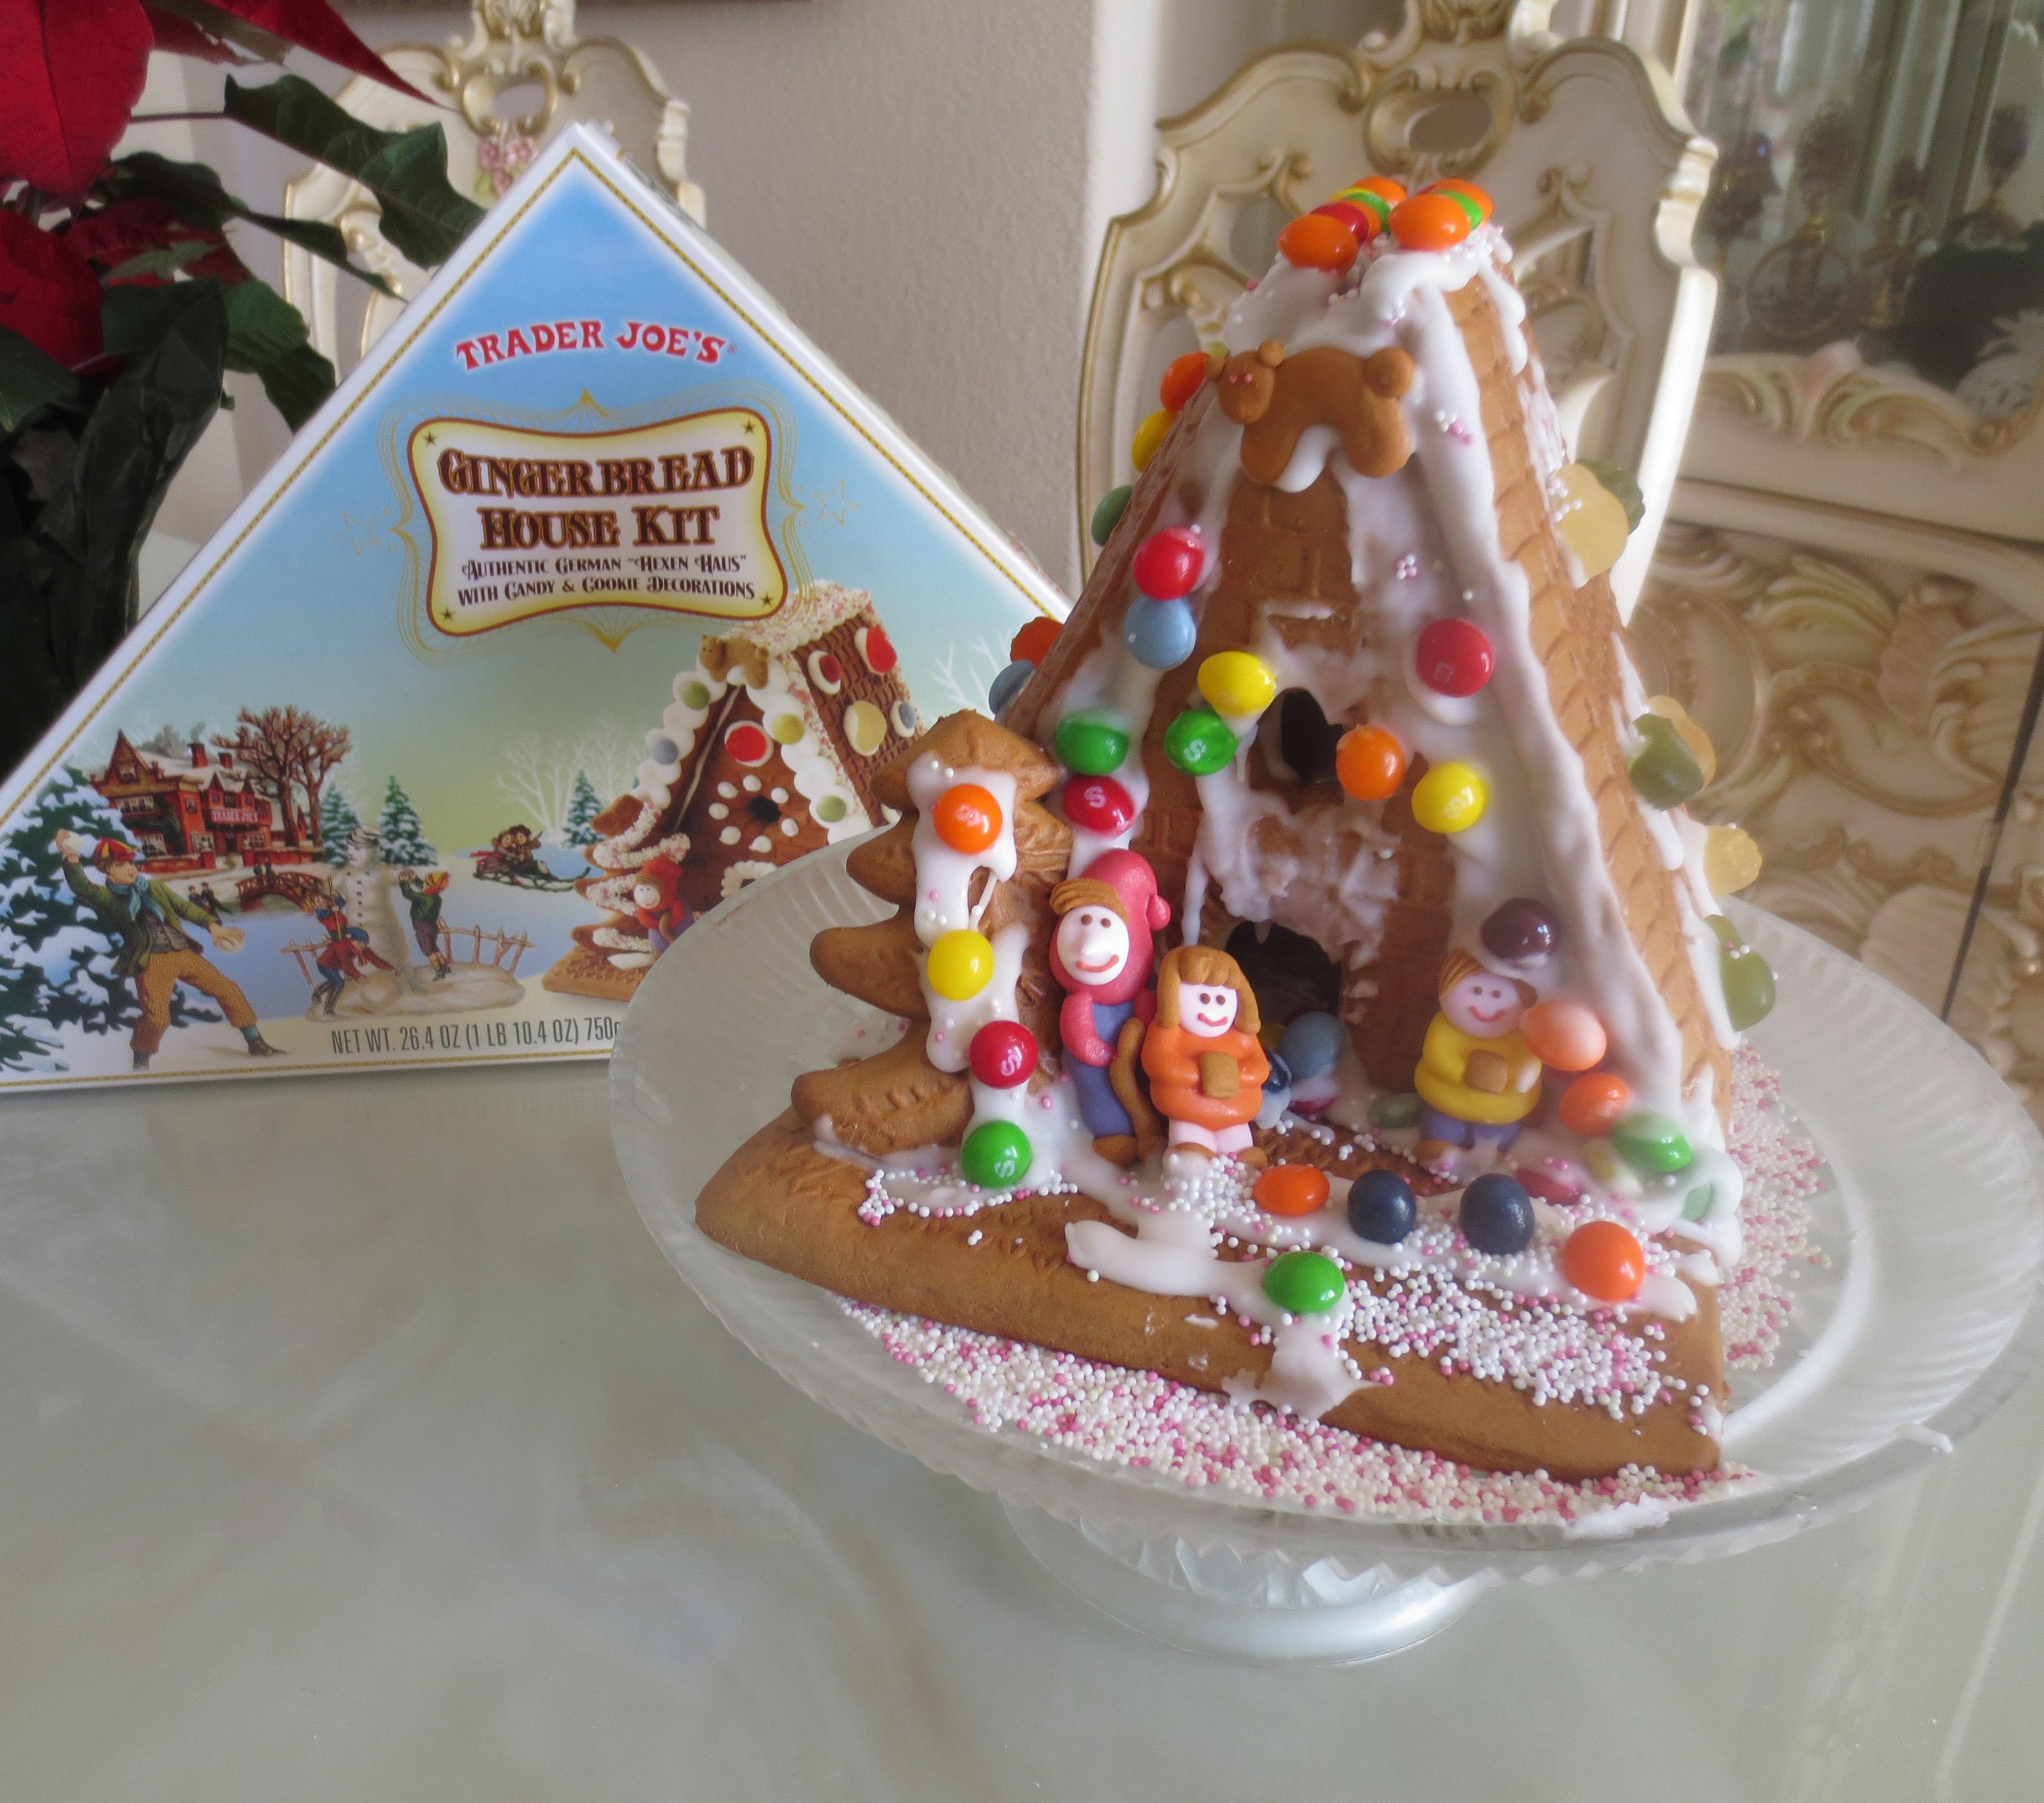 Christmas Gingerbread House Kit.Trader Joe S Gingerbread House Kit The Ranch On Silver Creek